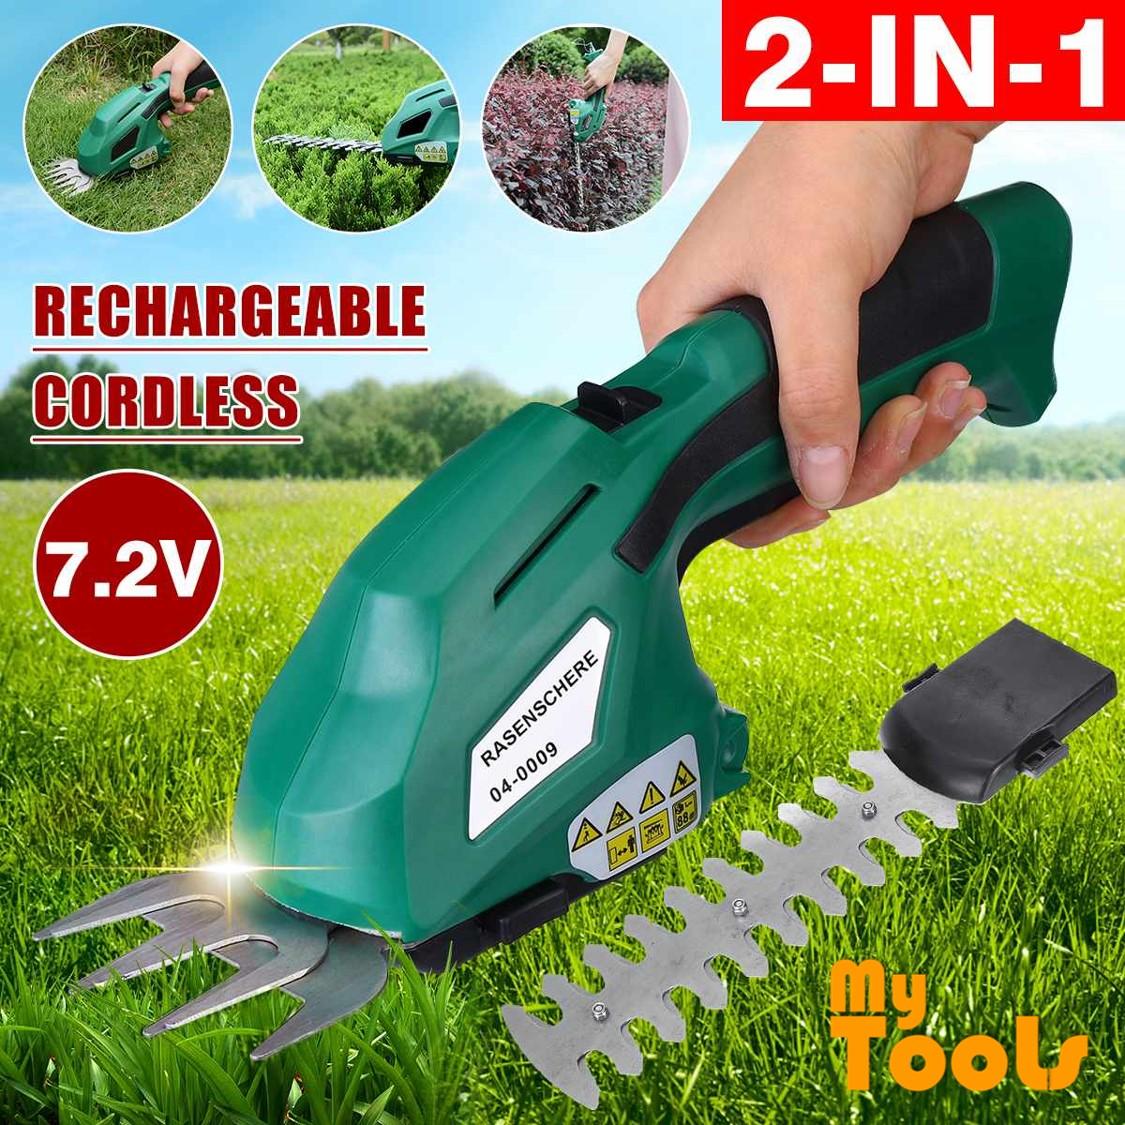 Mytools 2 in 1 7.2V Lithium Cordless Grass & Shrub Hedge Trimmer Shear